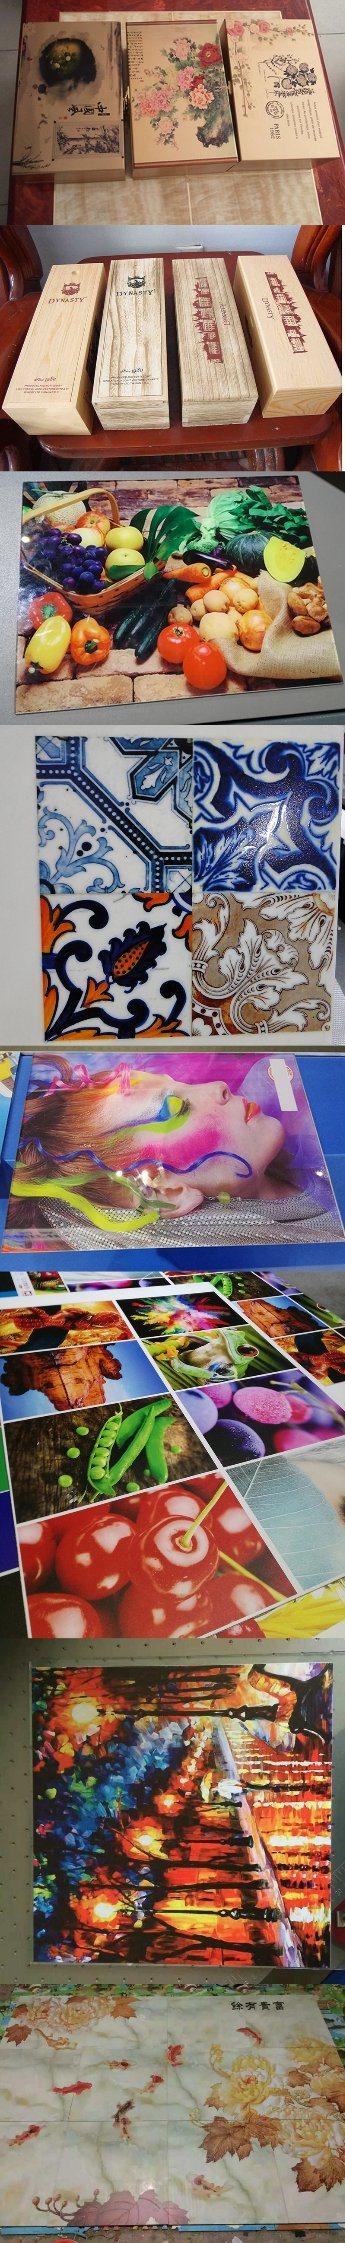 Large Format UV Flatbed Printer for Ceramic Tile/Glass/Metal/Wood/Aluminum Plastic Board/Foam Board/T-Shirt